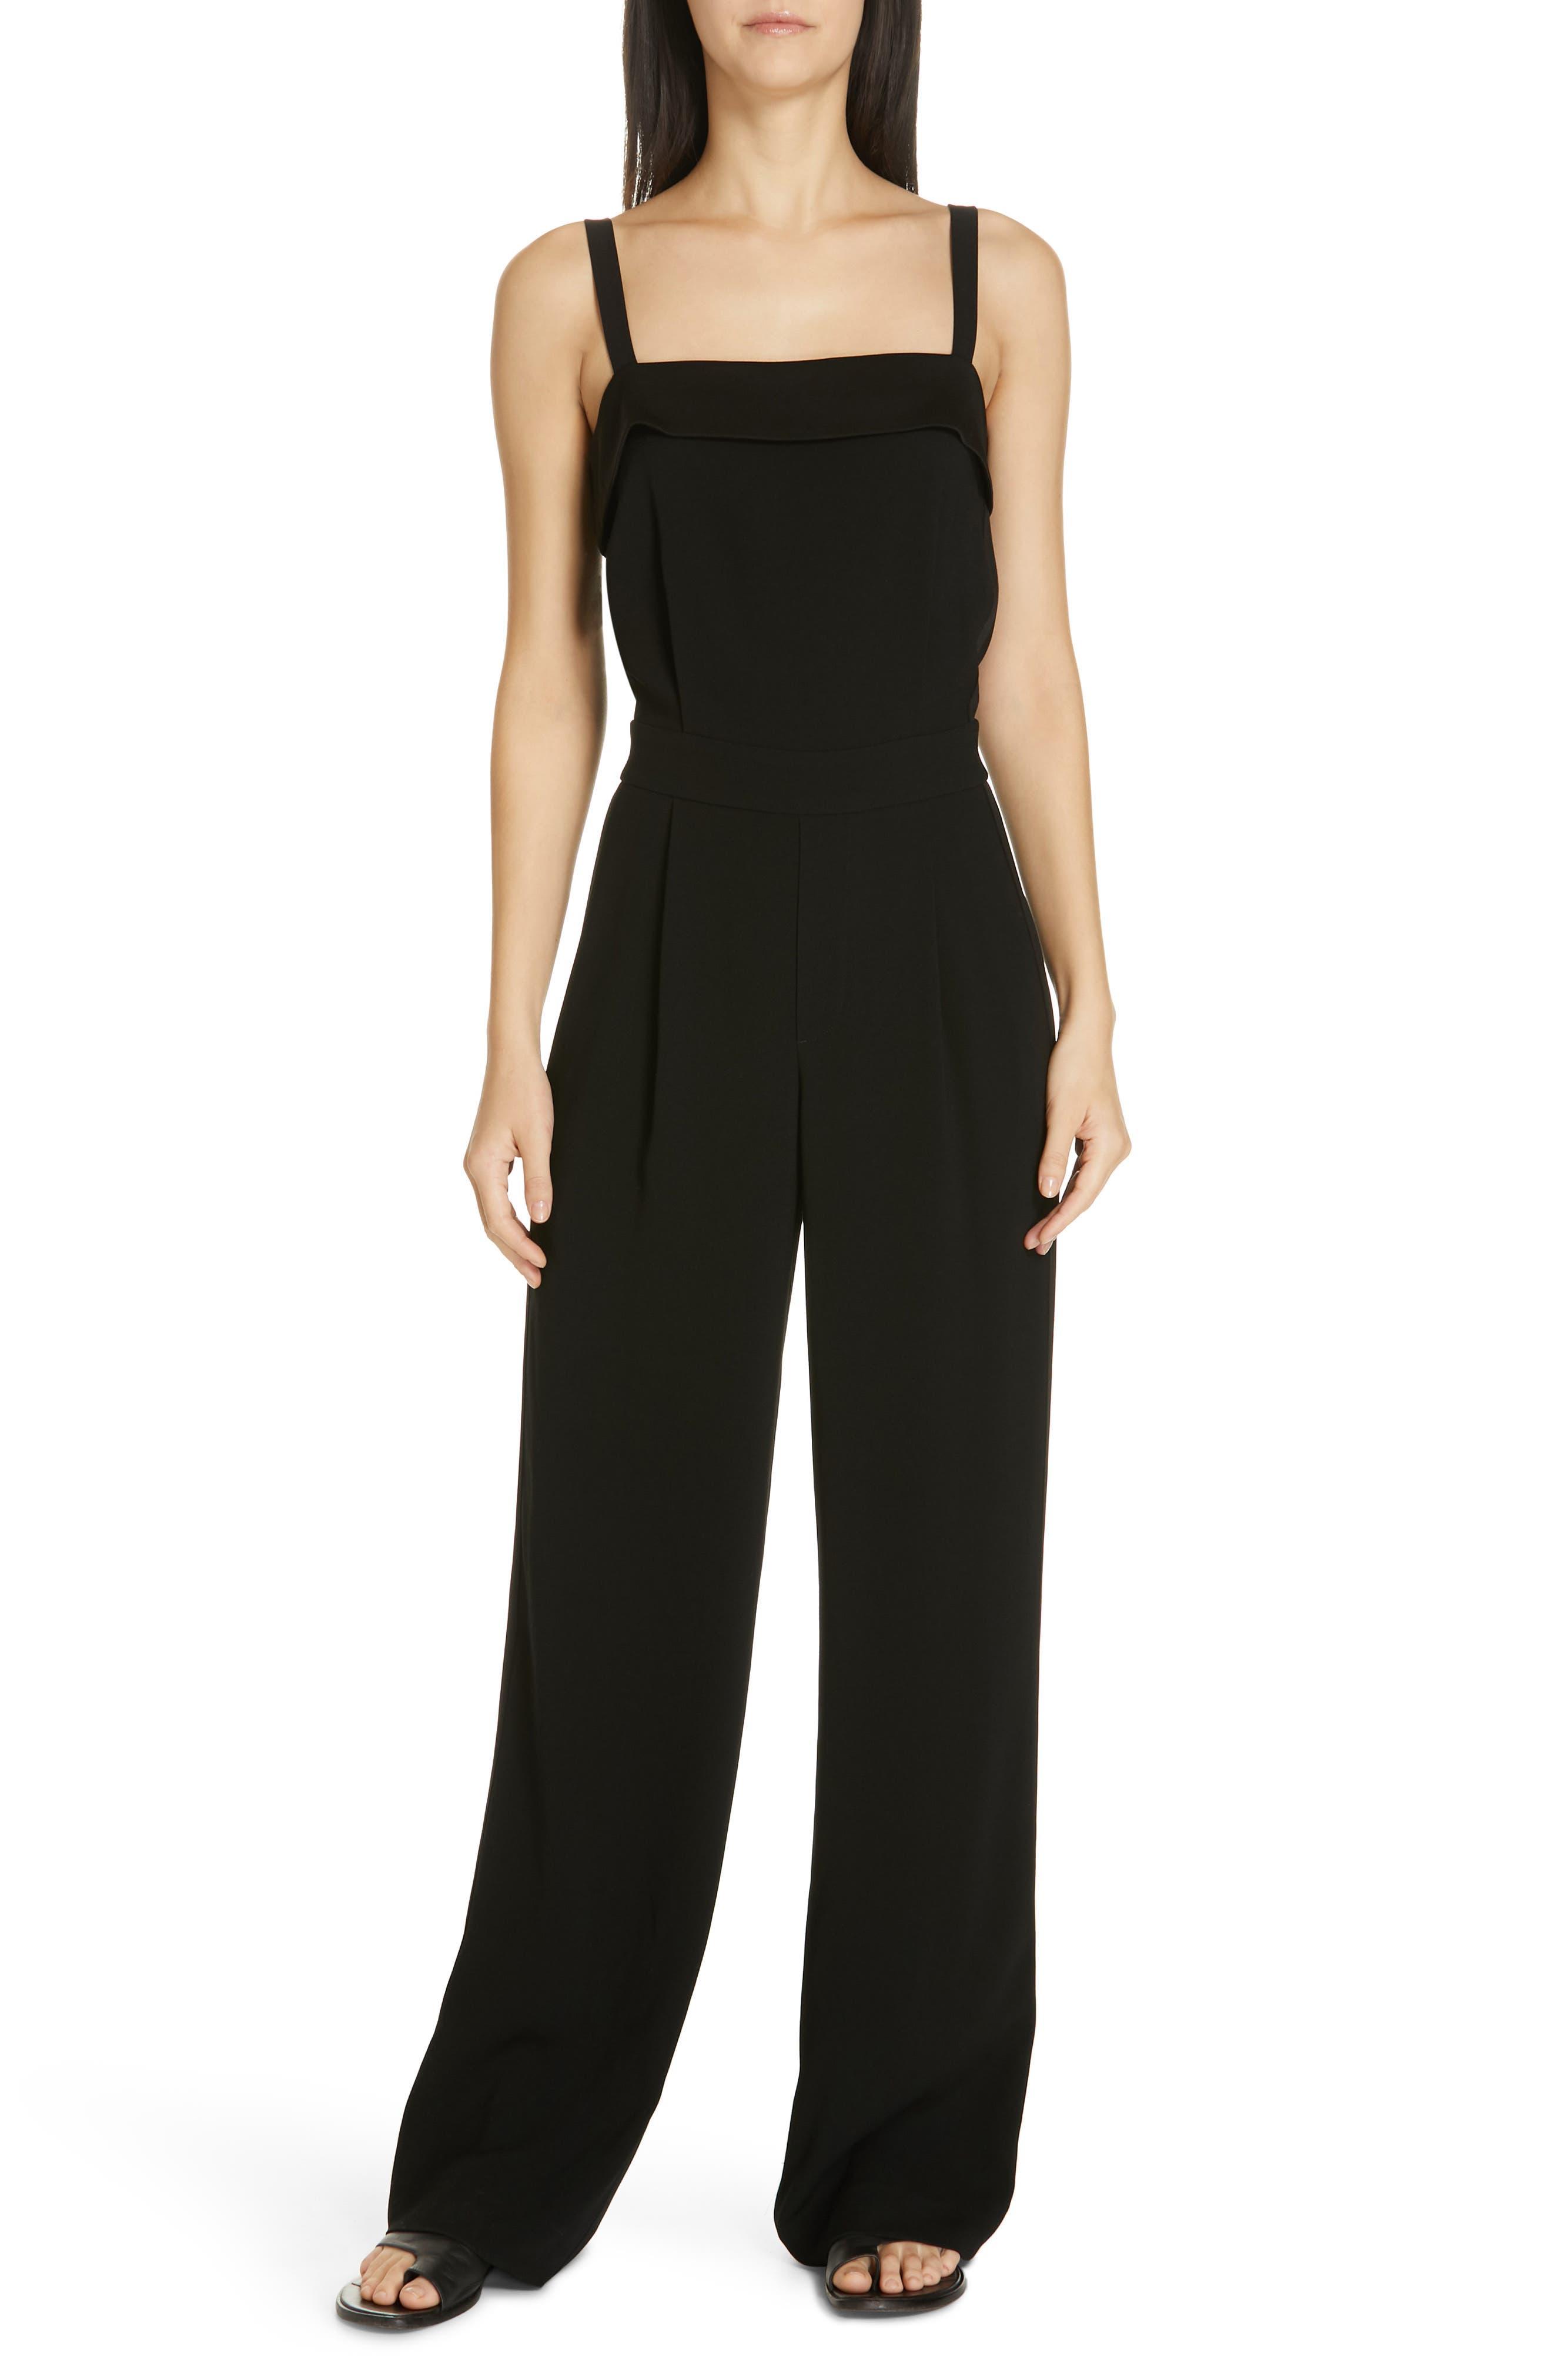 VINCE, Sleeveless Tuxedo Jumpsuit, Main thumbnail 1, color, BLACK